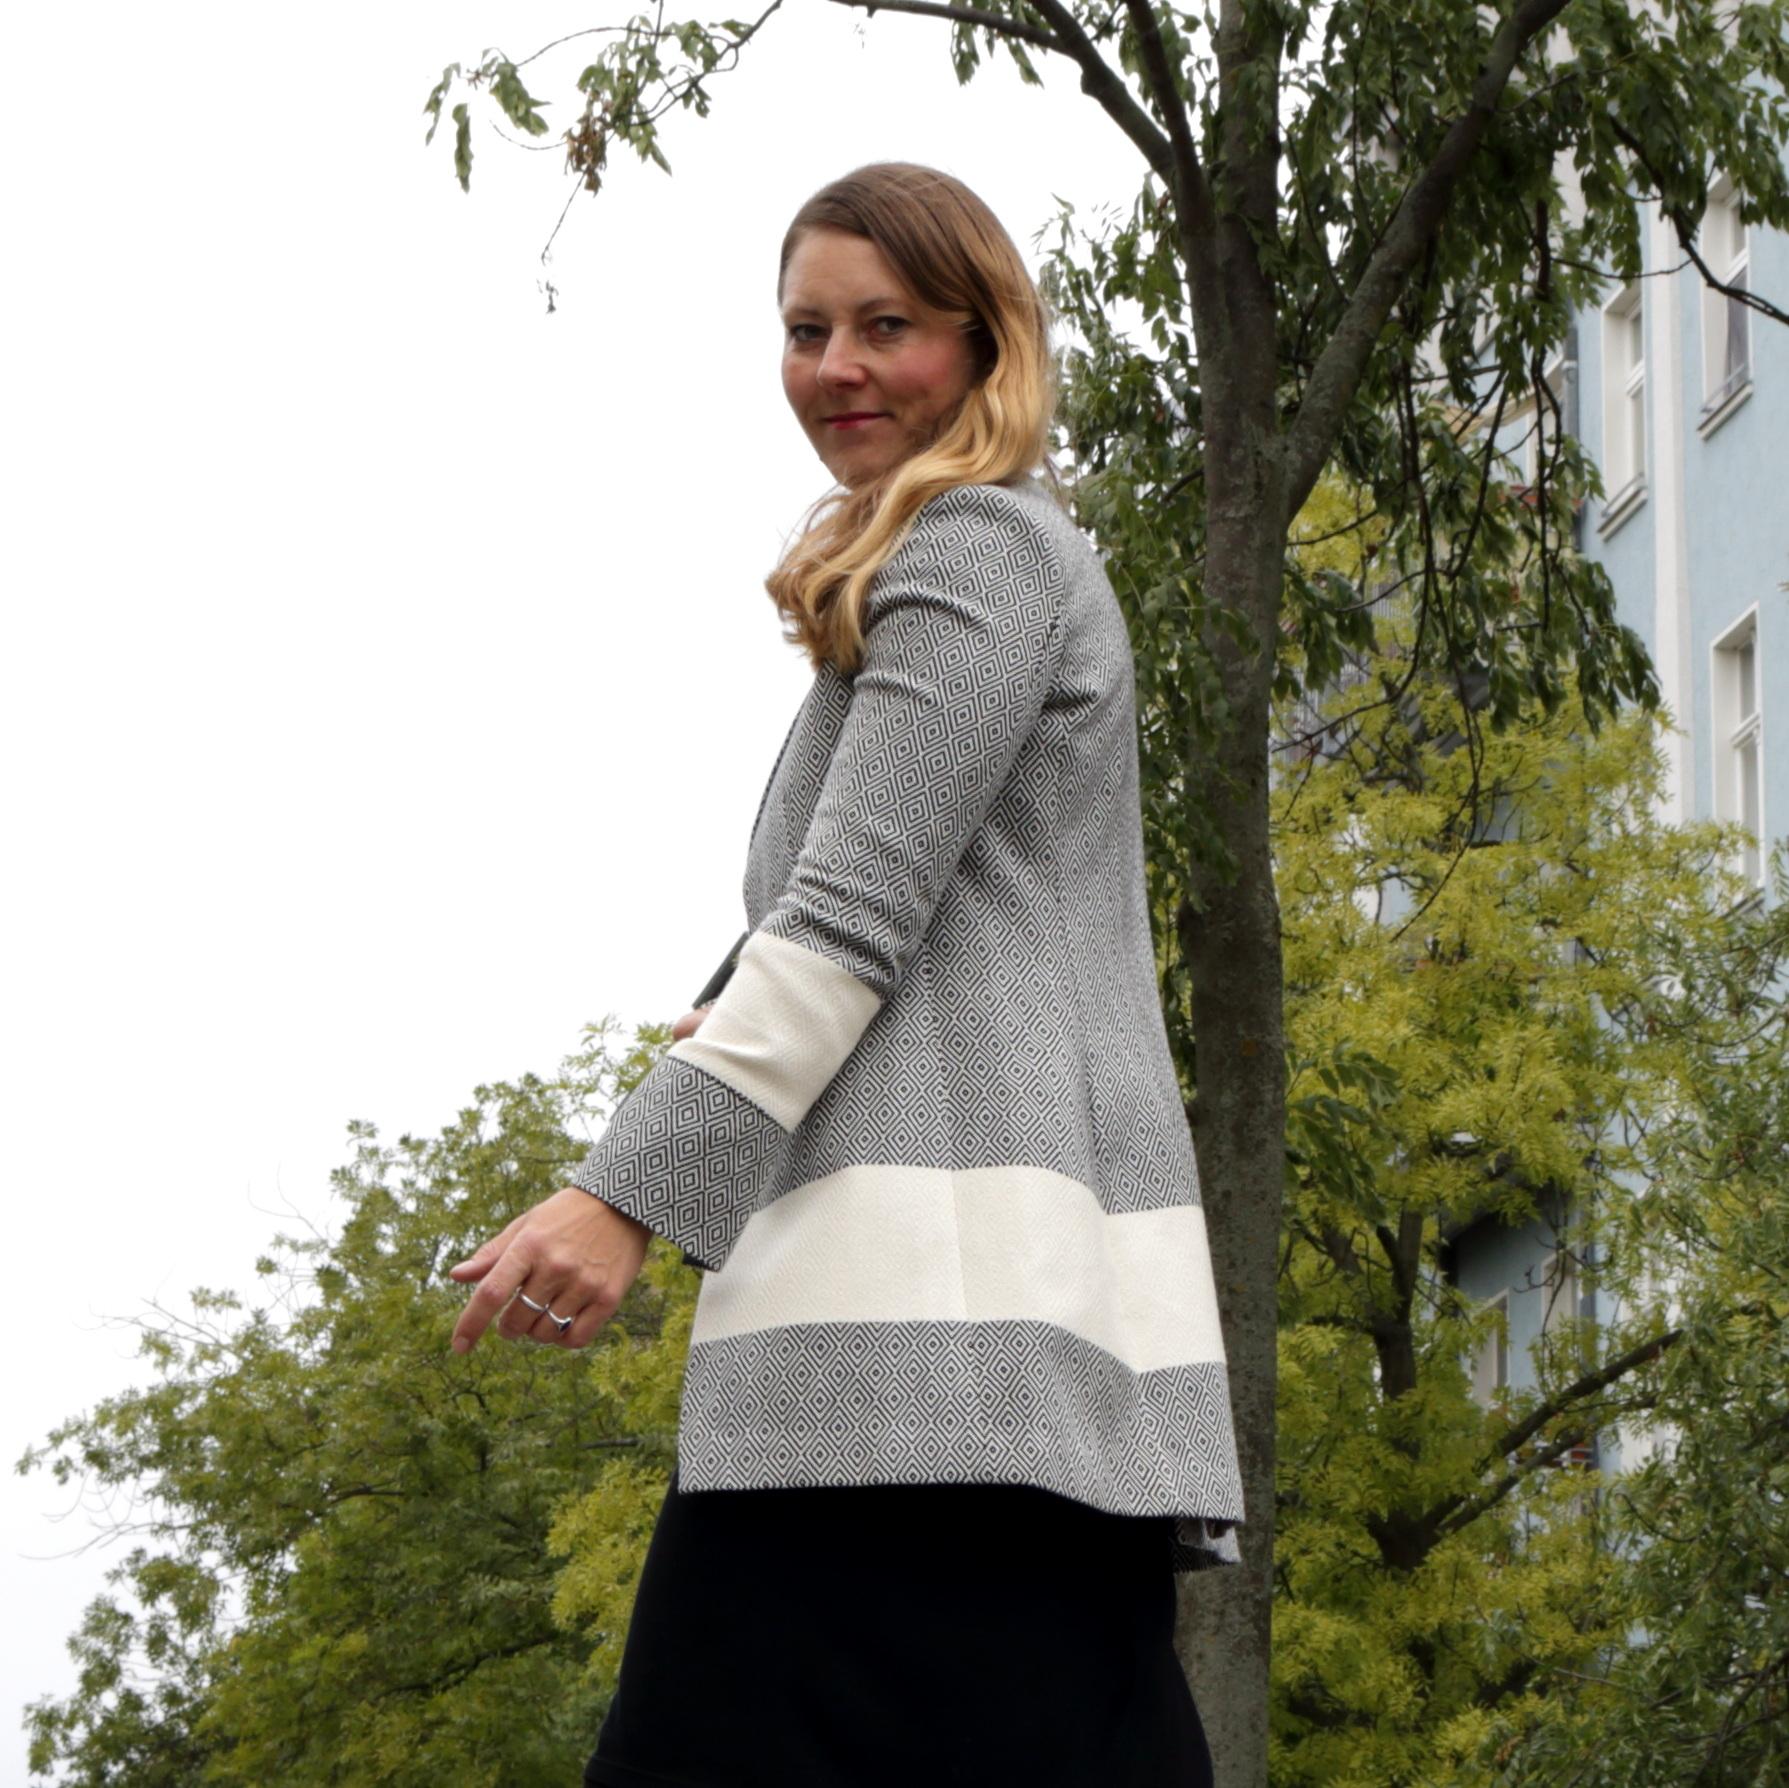 Gundara - design - longjacket - cotton - hamam towel - Berlin - elegant